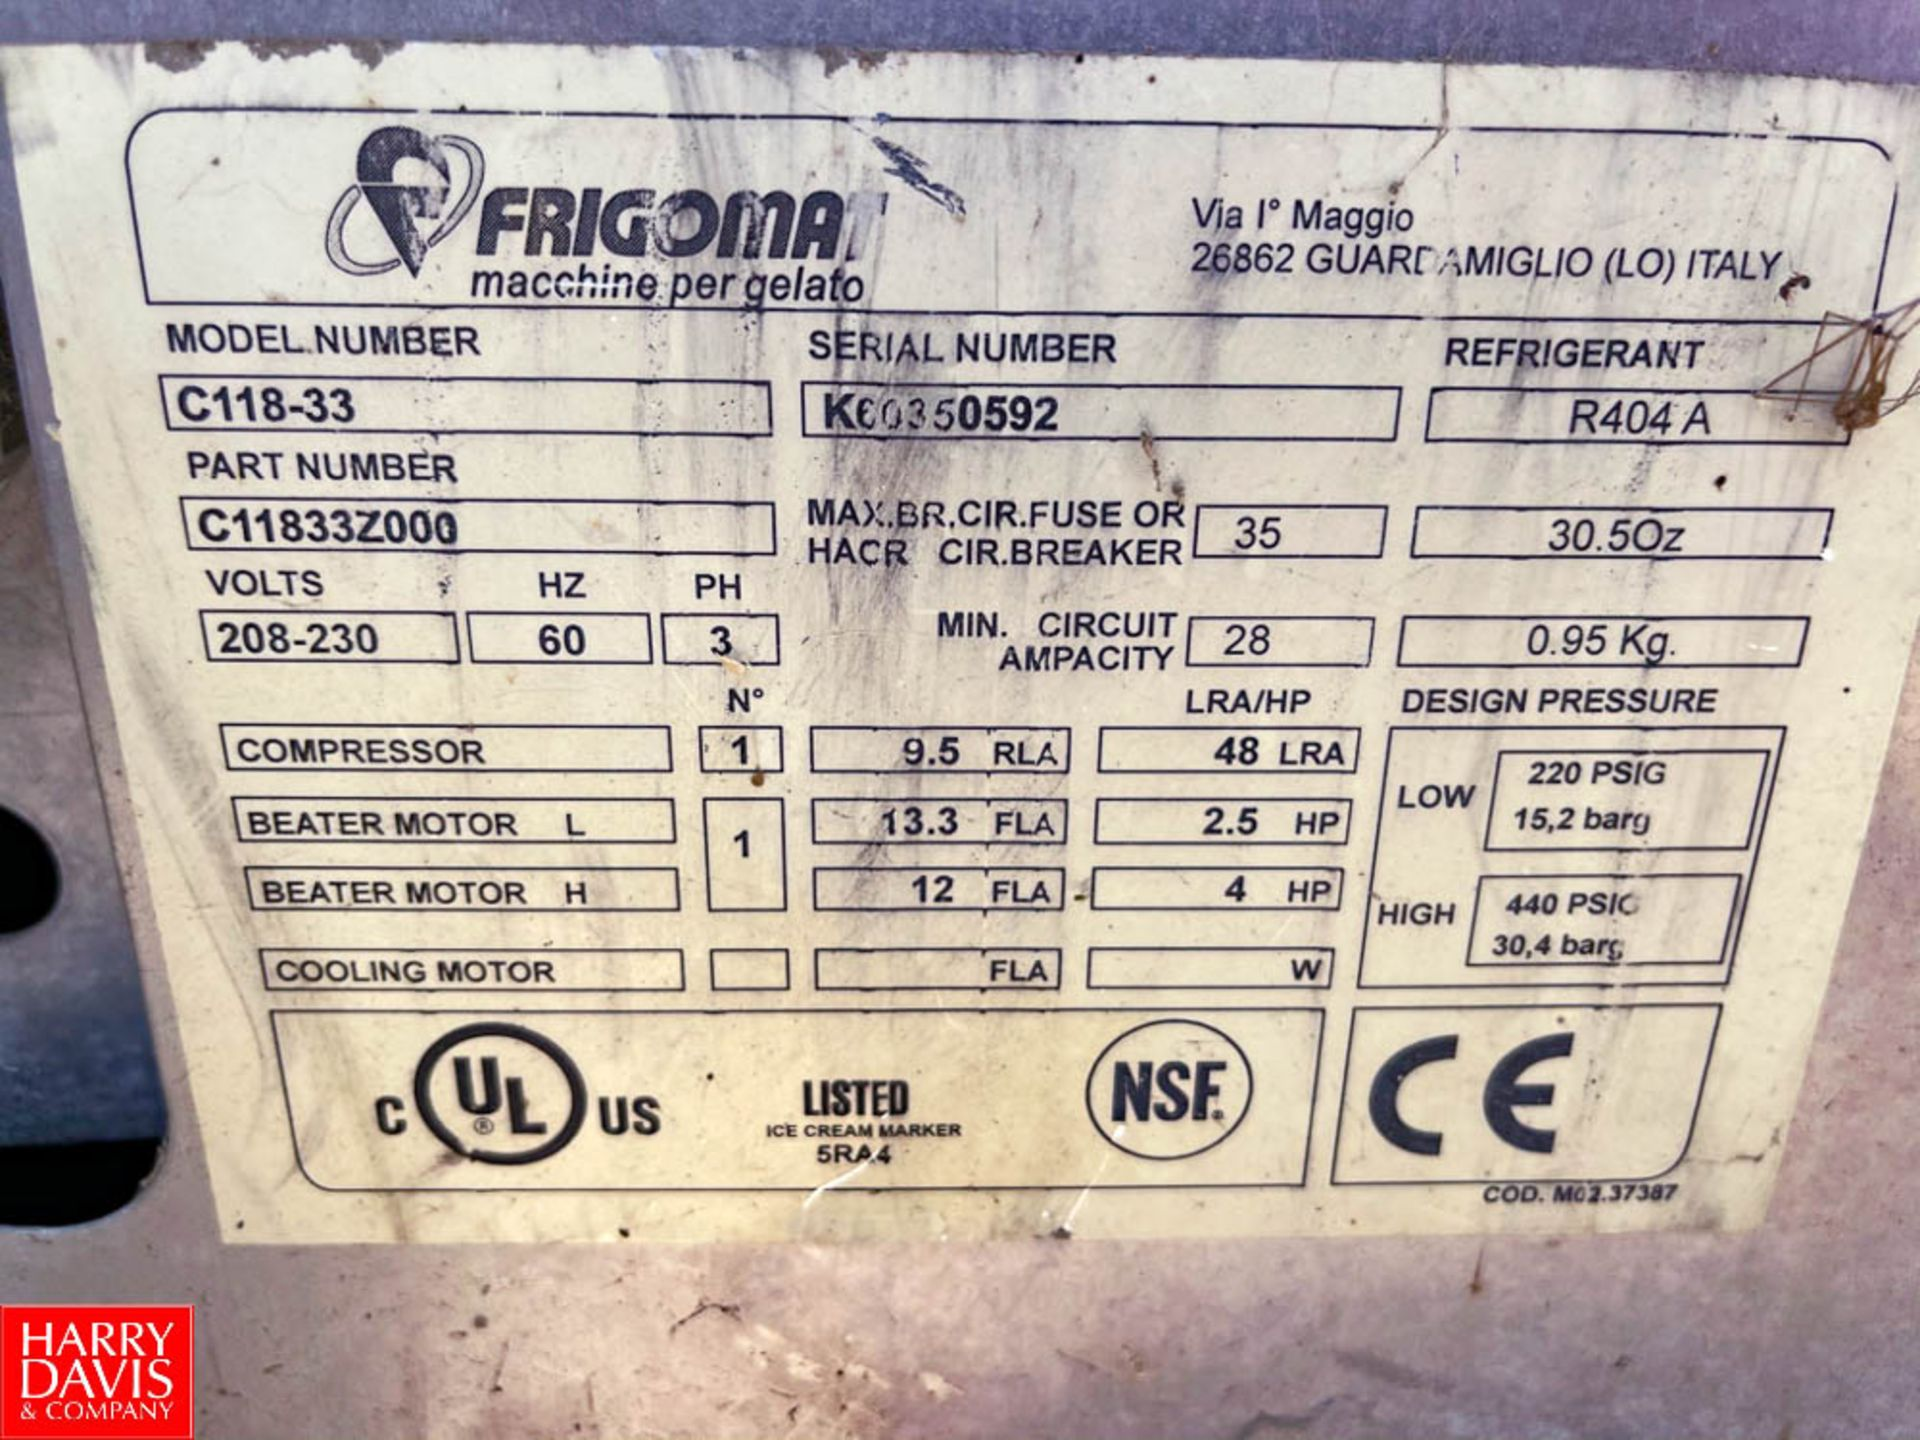 Taylor Frigomat Batch Ice Cream Freezer Model: C118-33 : SN K60350592, R404A Rigging Fee: $100 - Image 2 of 2